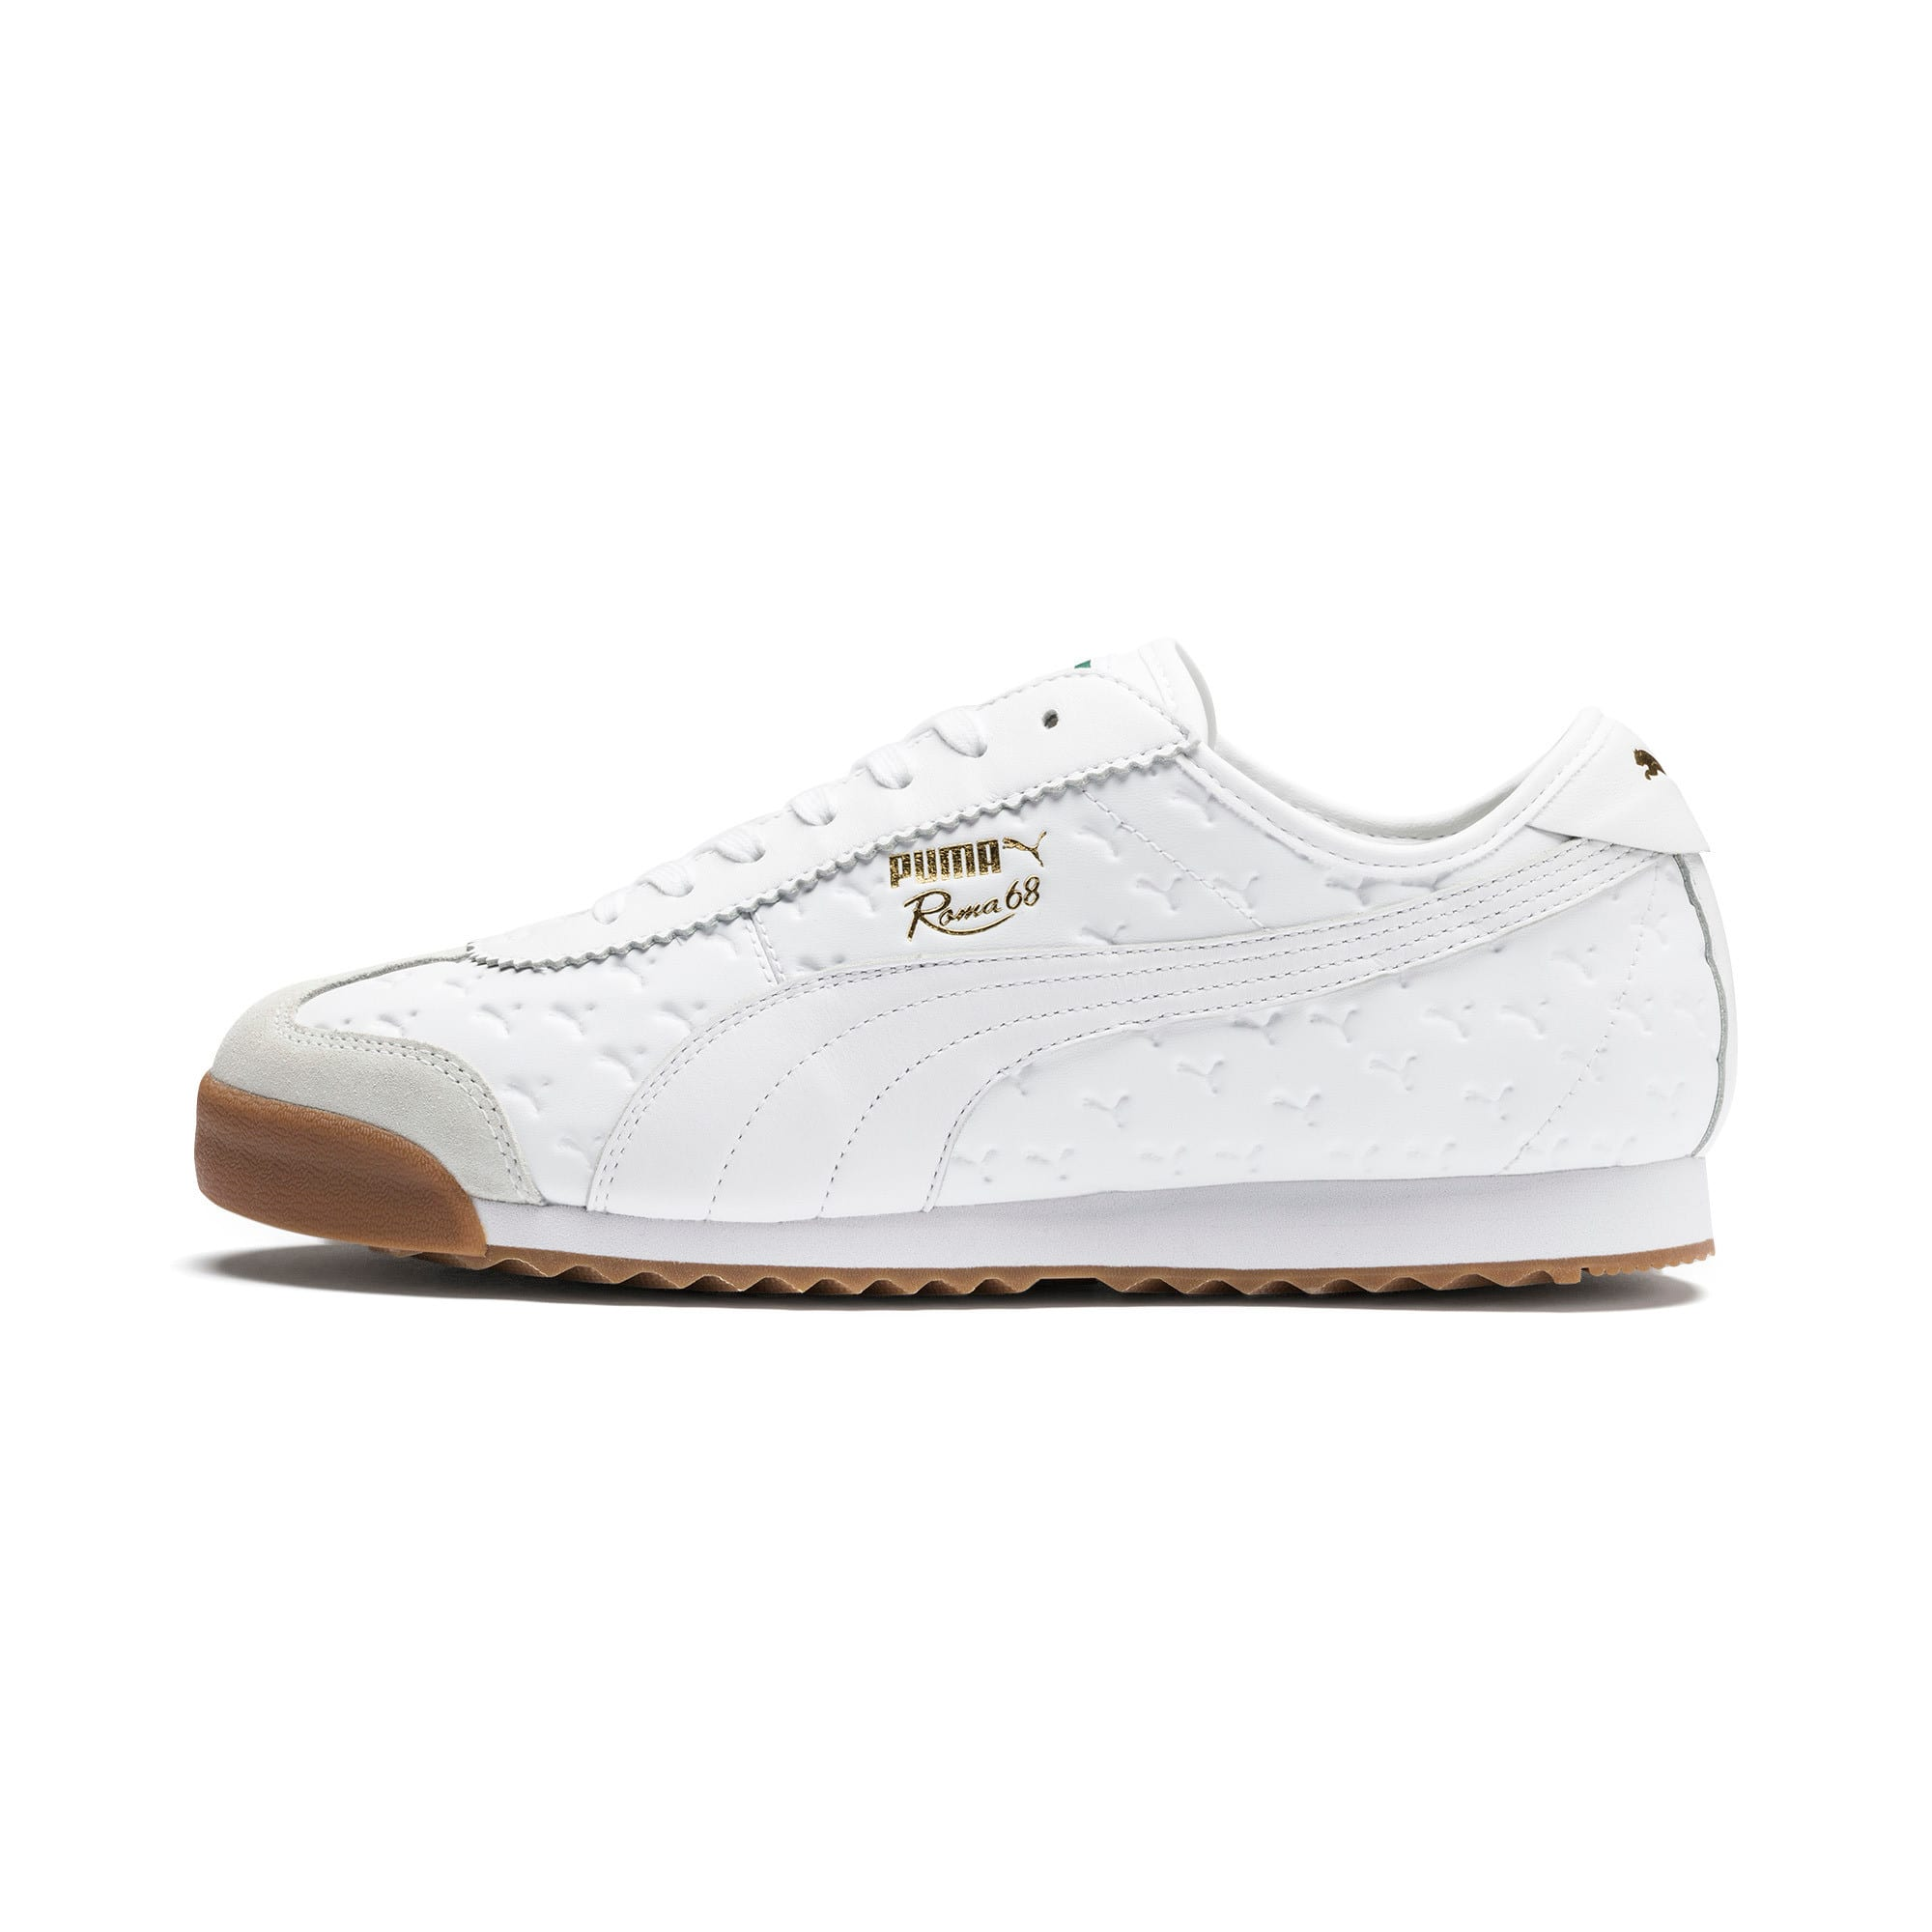 Thumbnail 1 of Roma '68 Gum Sneakers, Puma White-Puma White, medium